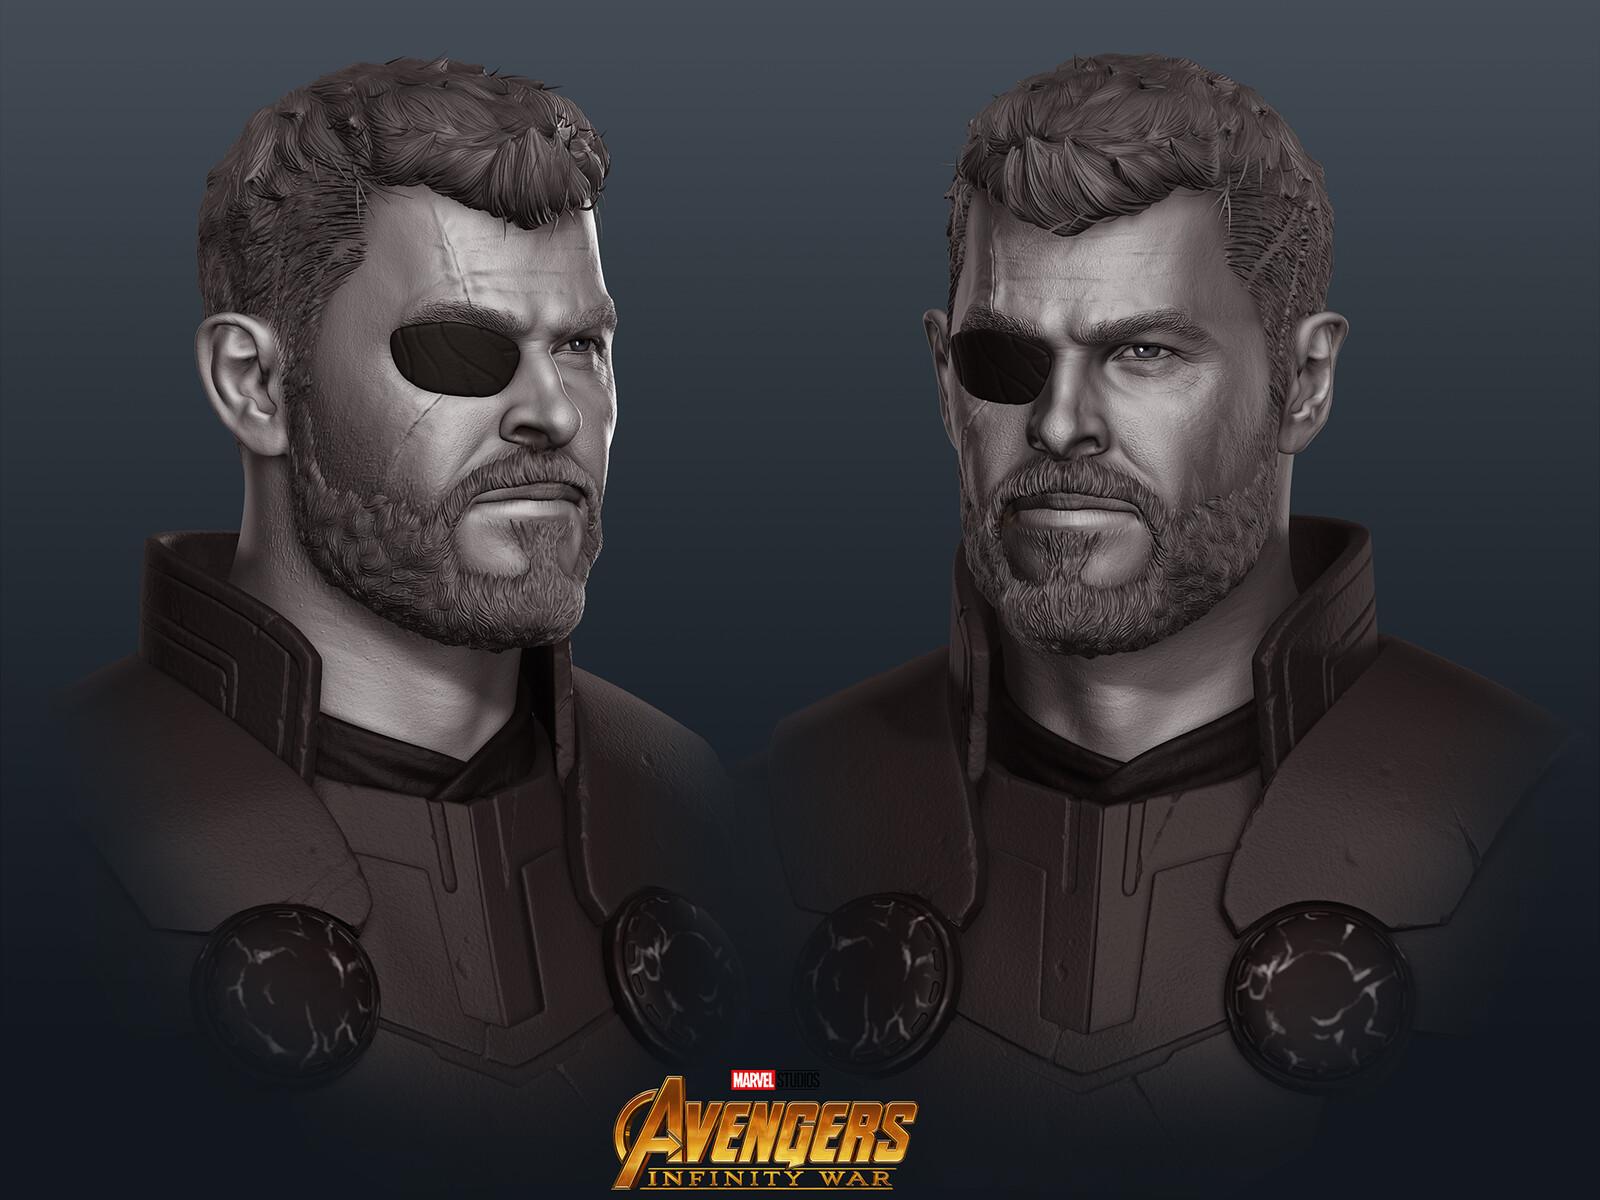 Avengers Infinity War Thor Chris Hemsworth Fanart